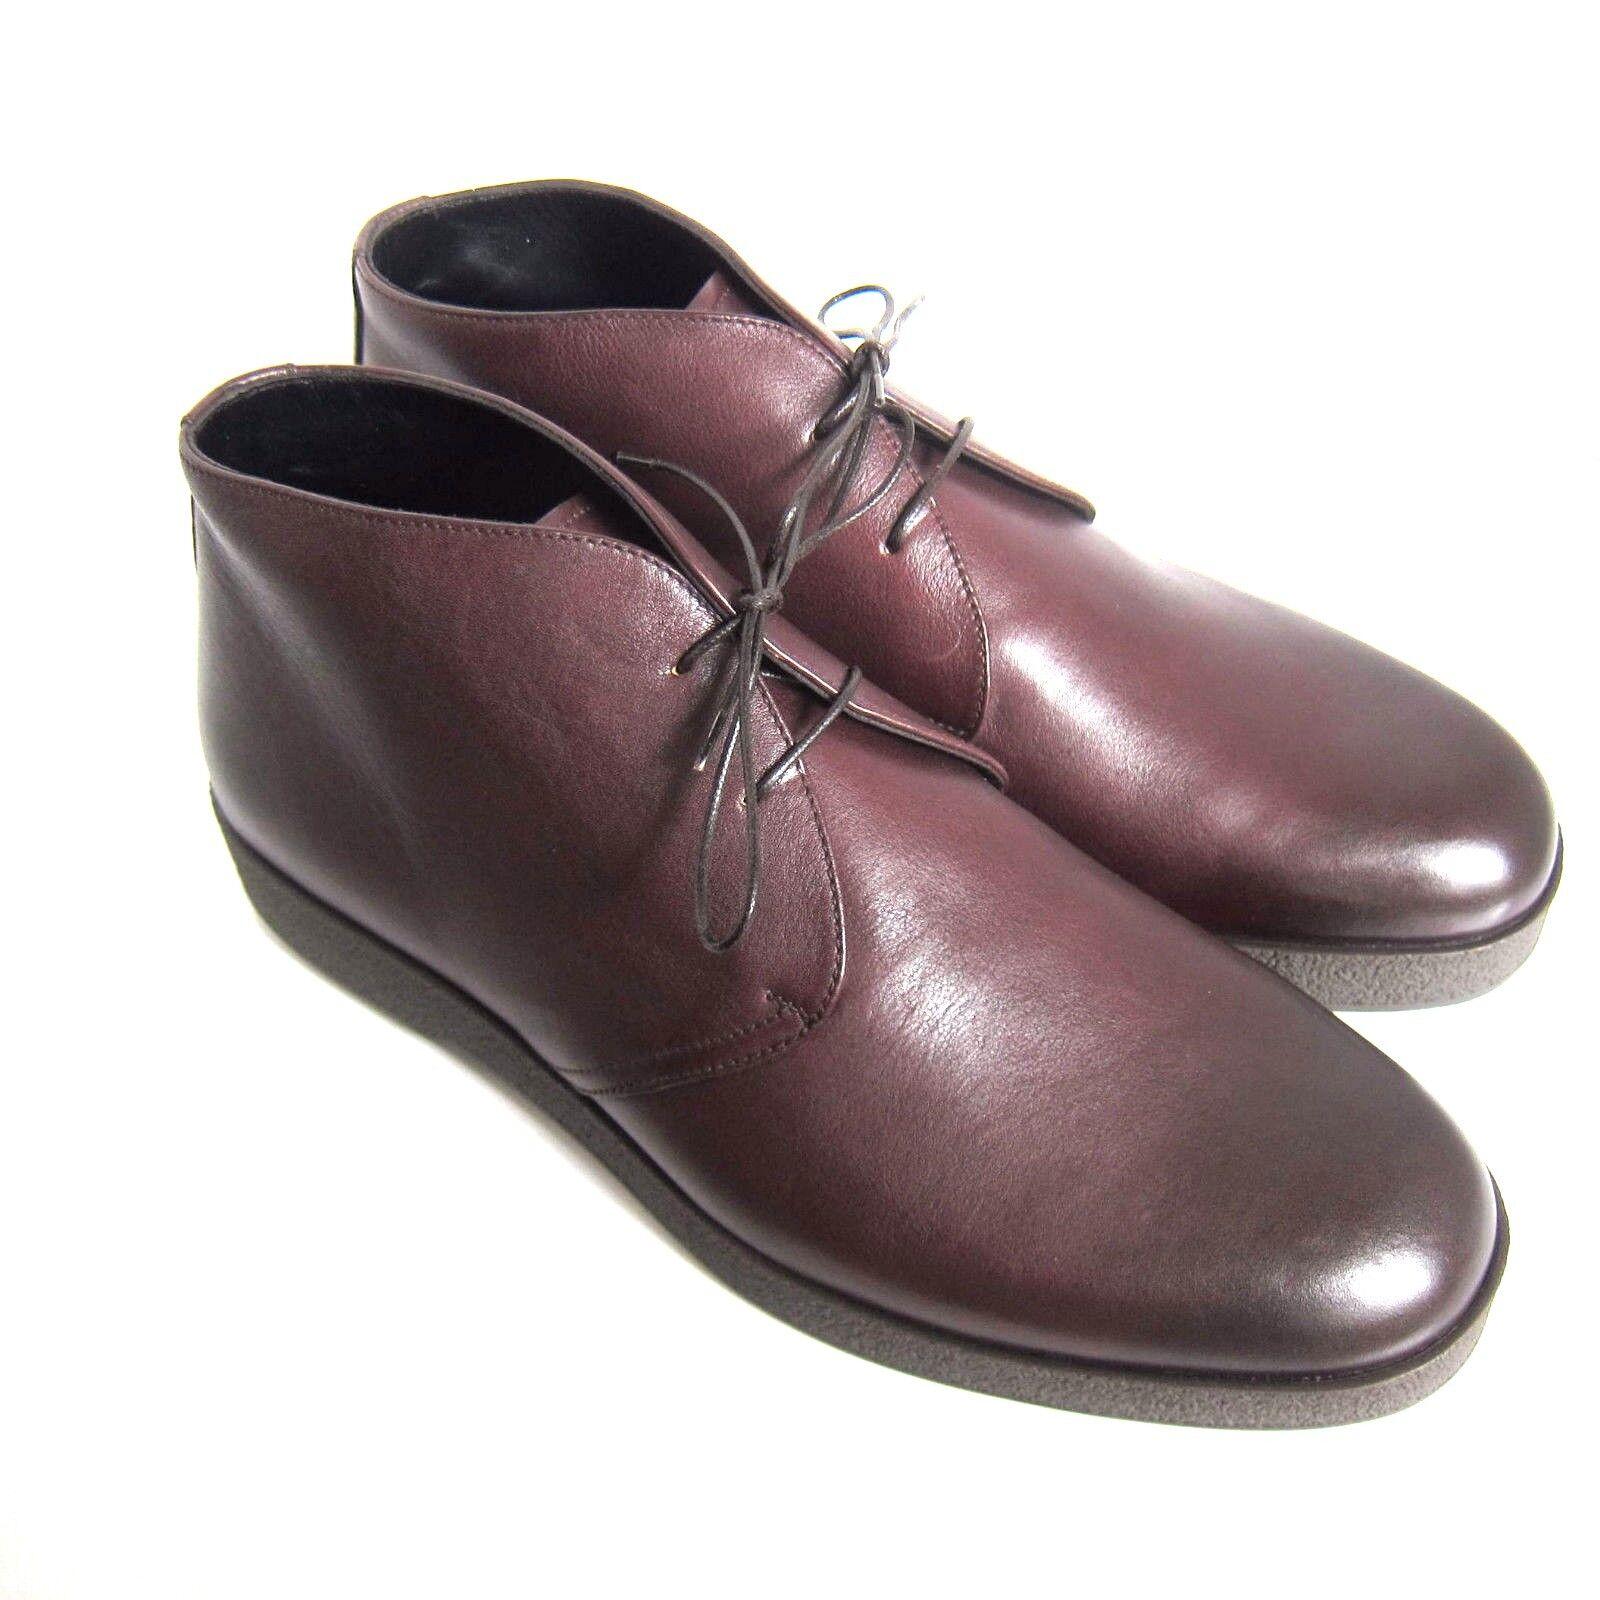 C-1352125 New Ermenegildo Size Zegna Pelle Stivali Shoes Size Ermenegildo US 12 D Marked 11EE aa4901